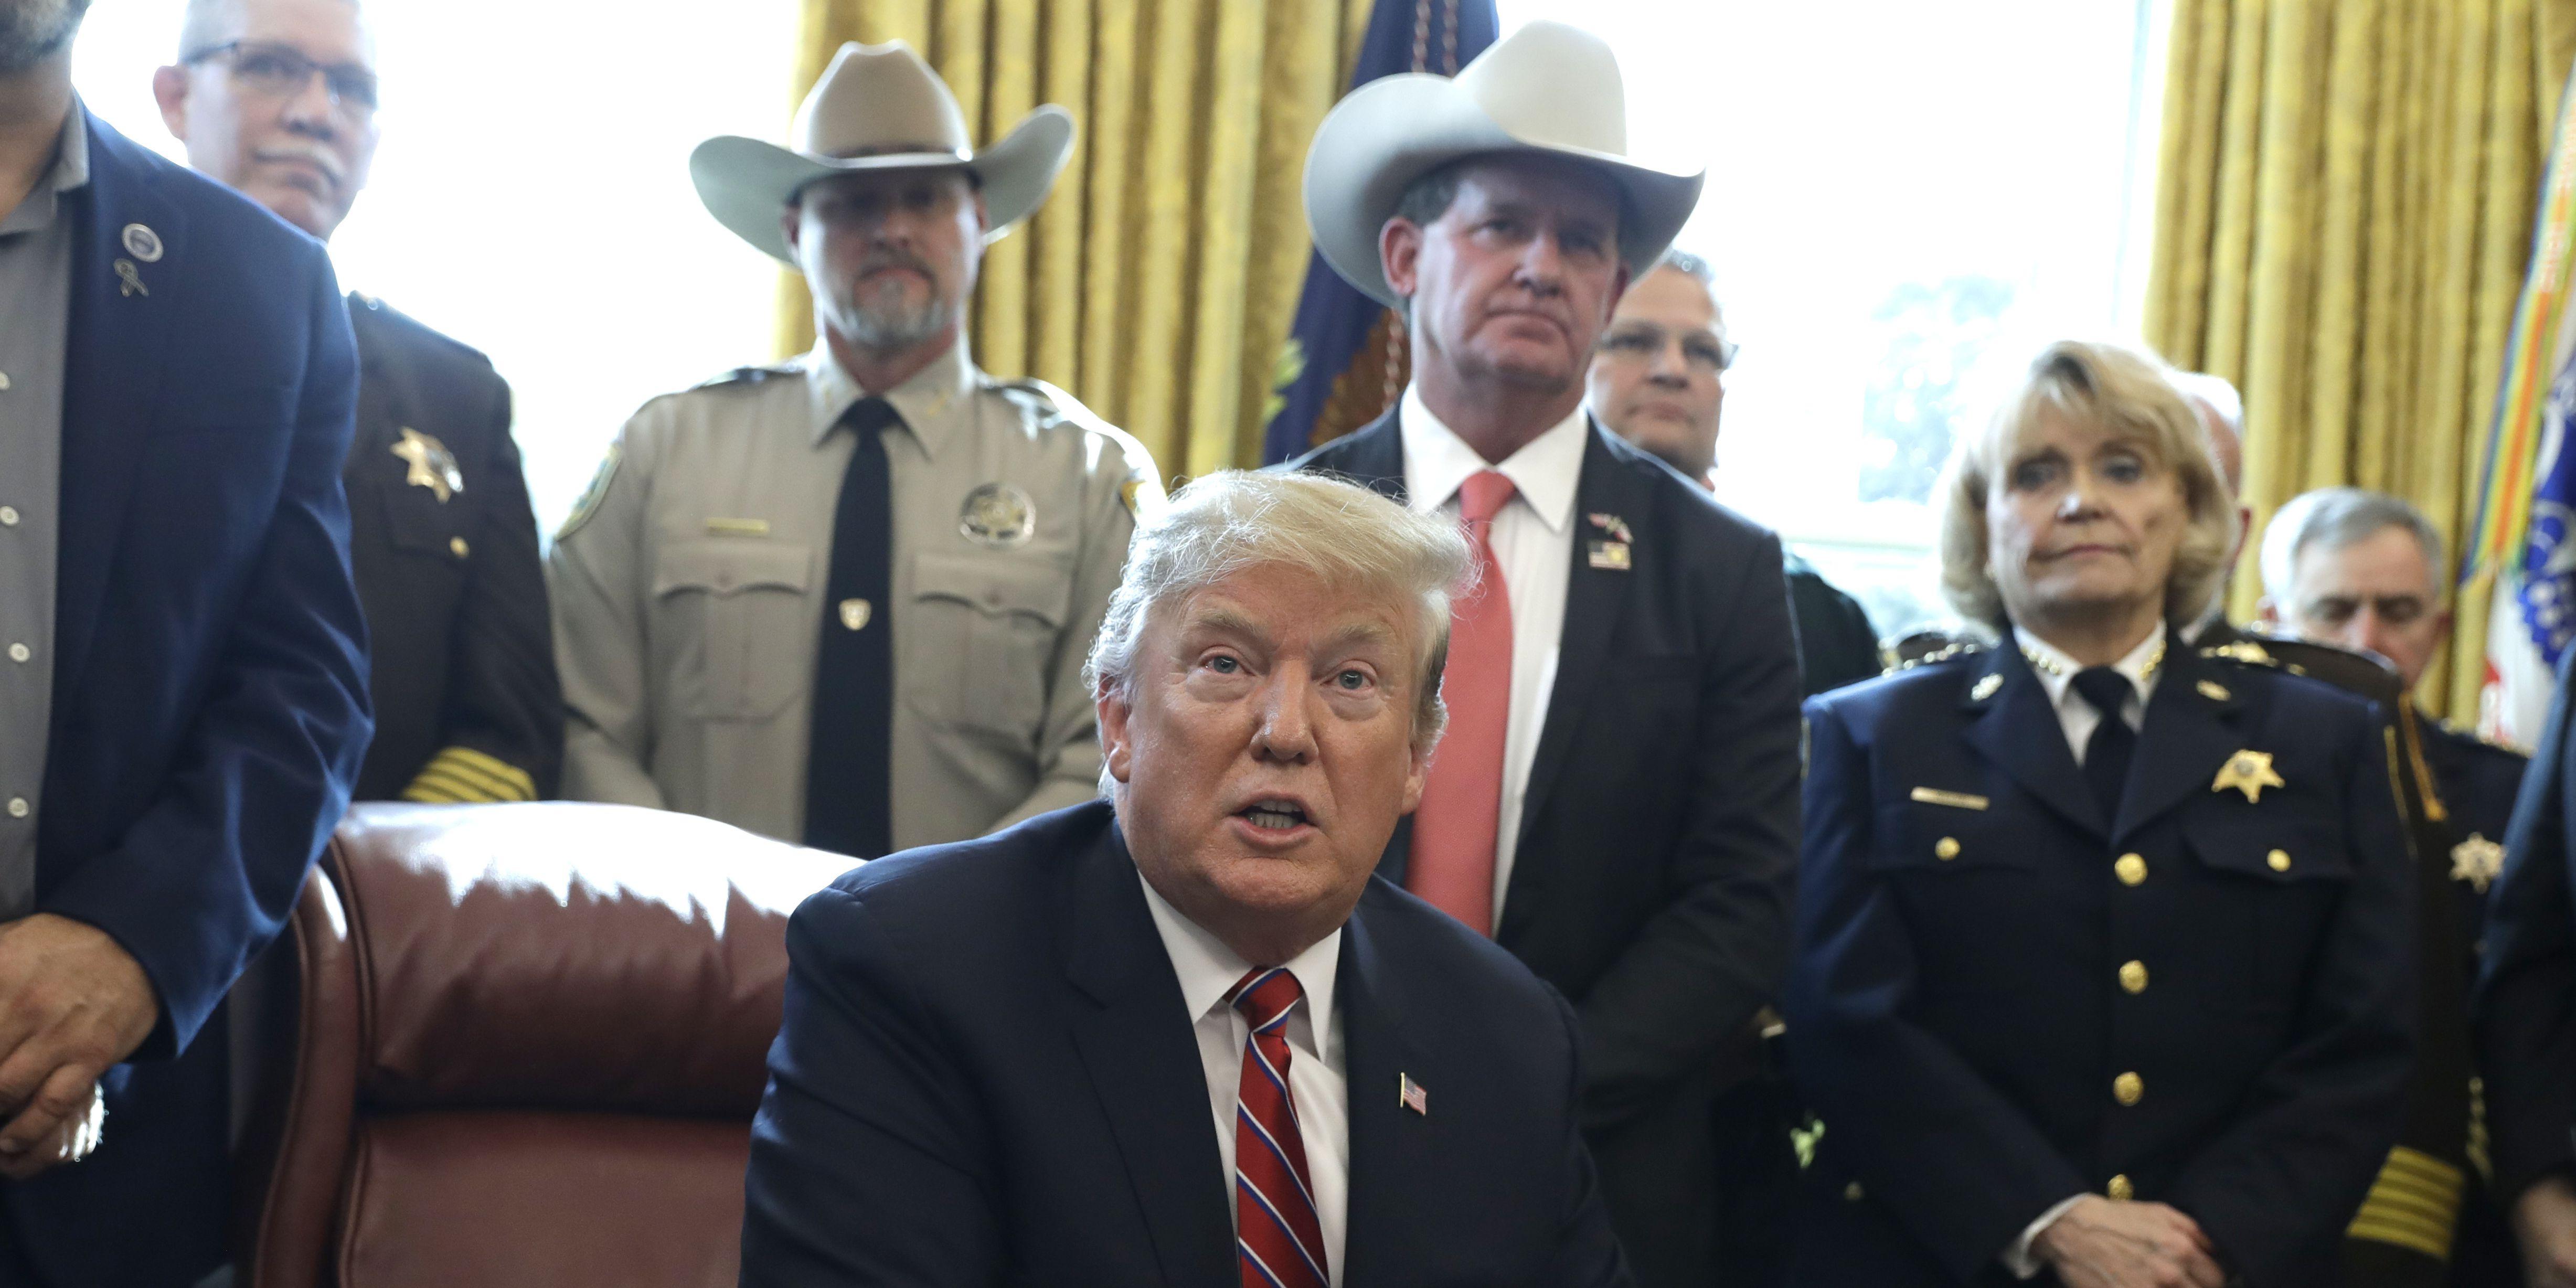 Trump downplays white nationalism threat after New Zealand massacre